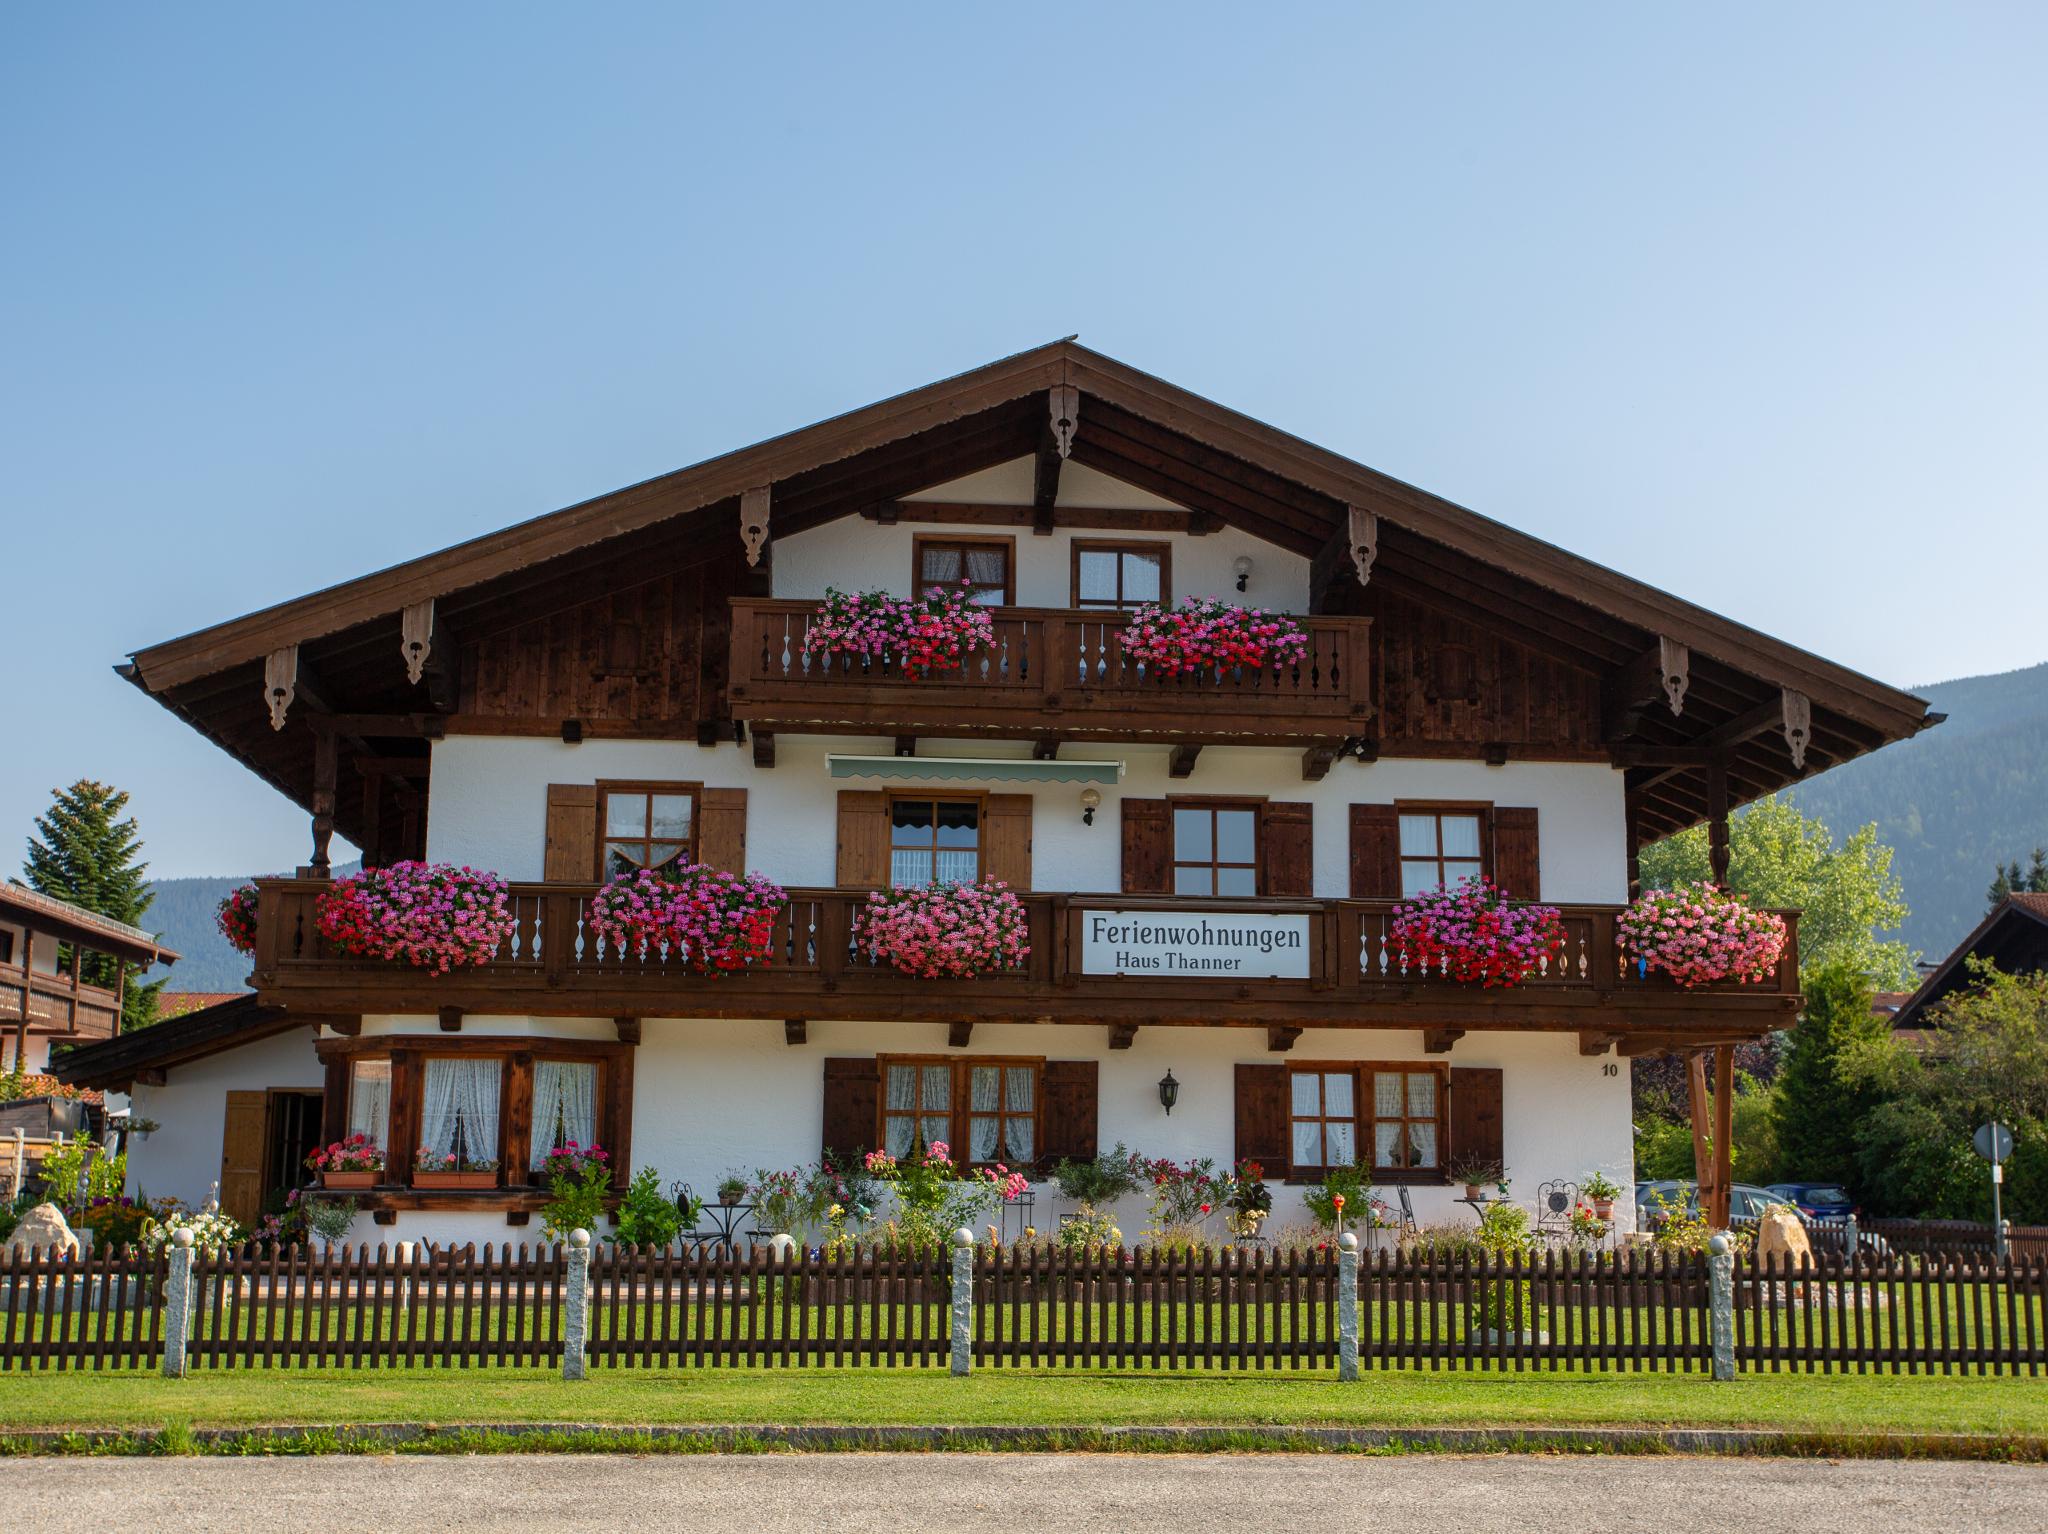 Inzell Karte.Haus Thanner Chiemgau Karte De Inzell Holiday Flat Chiemgau Alps